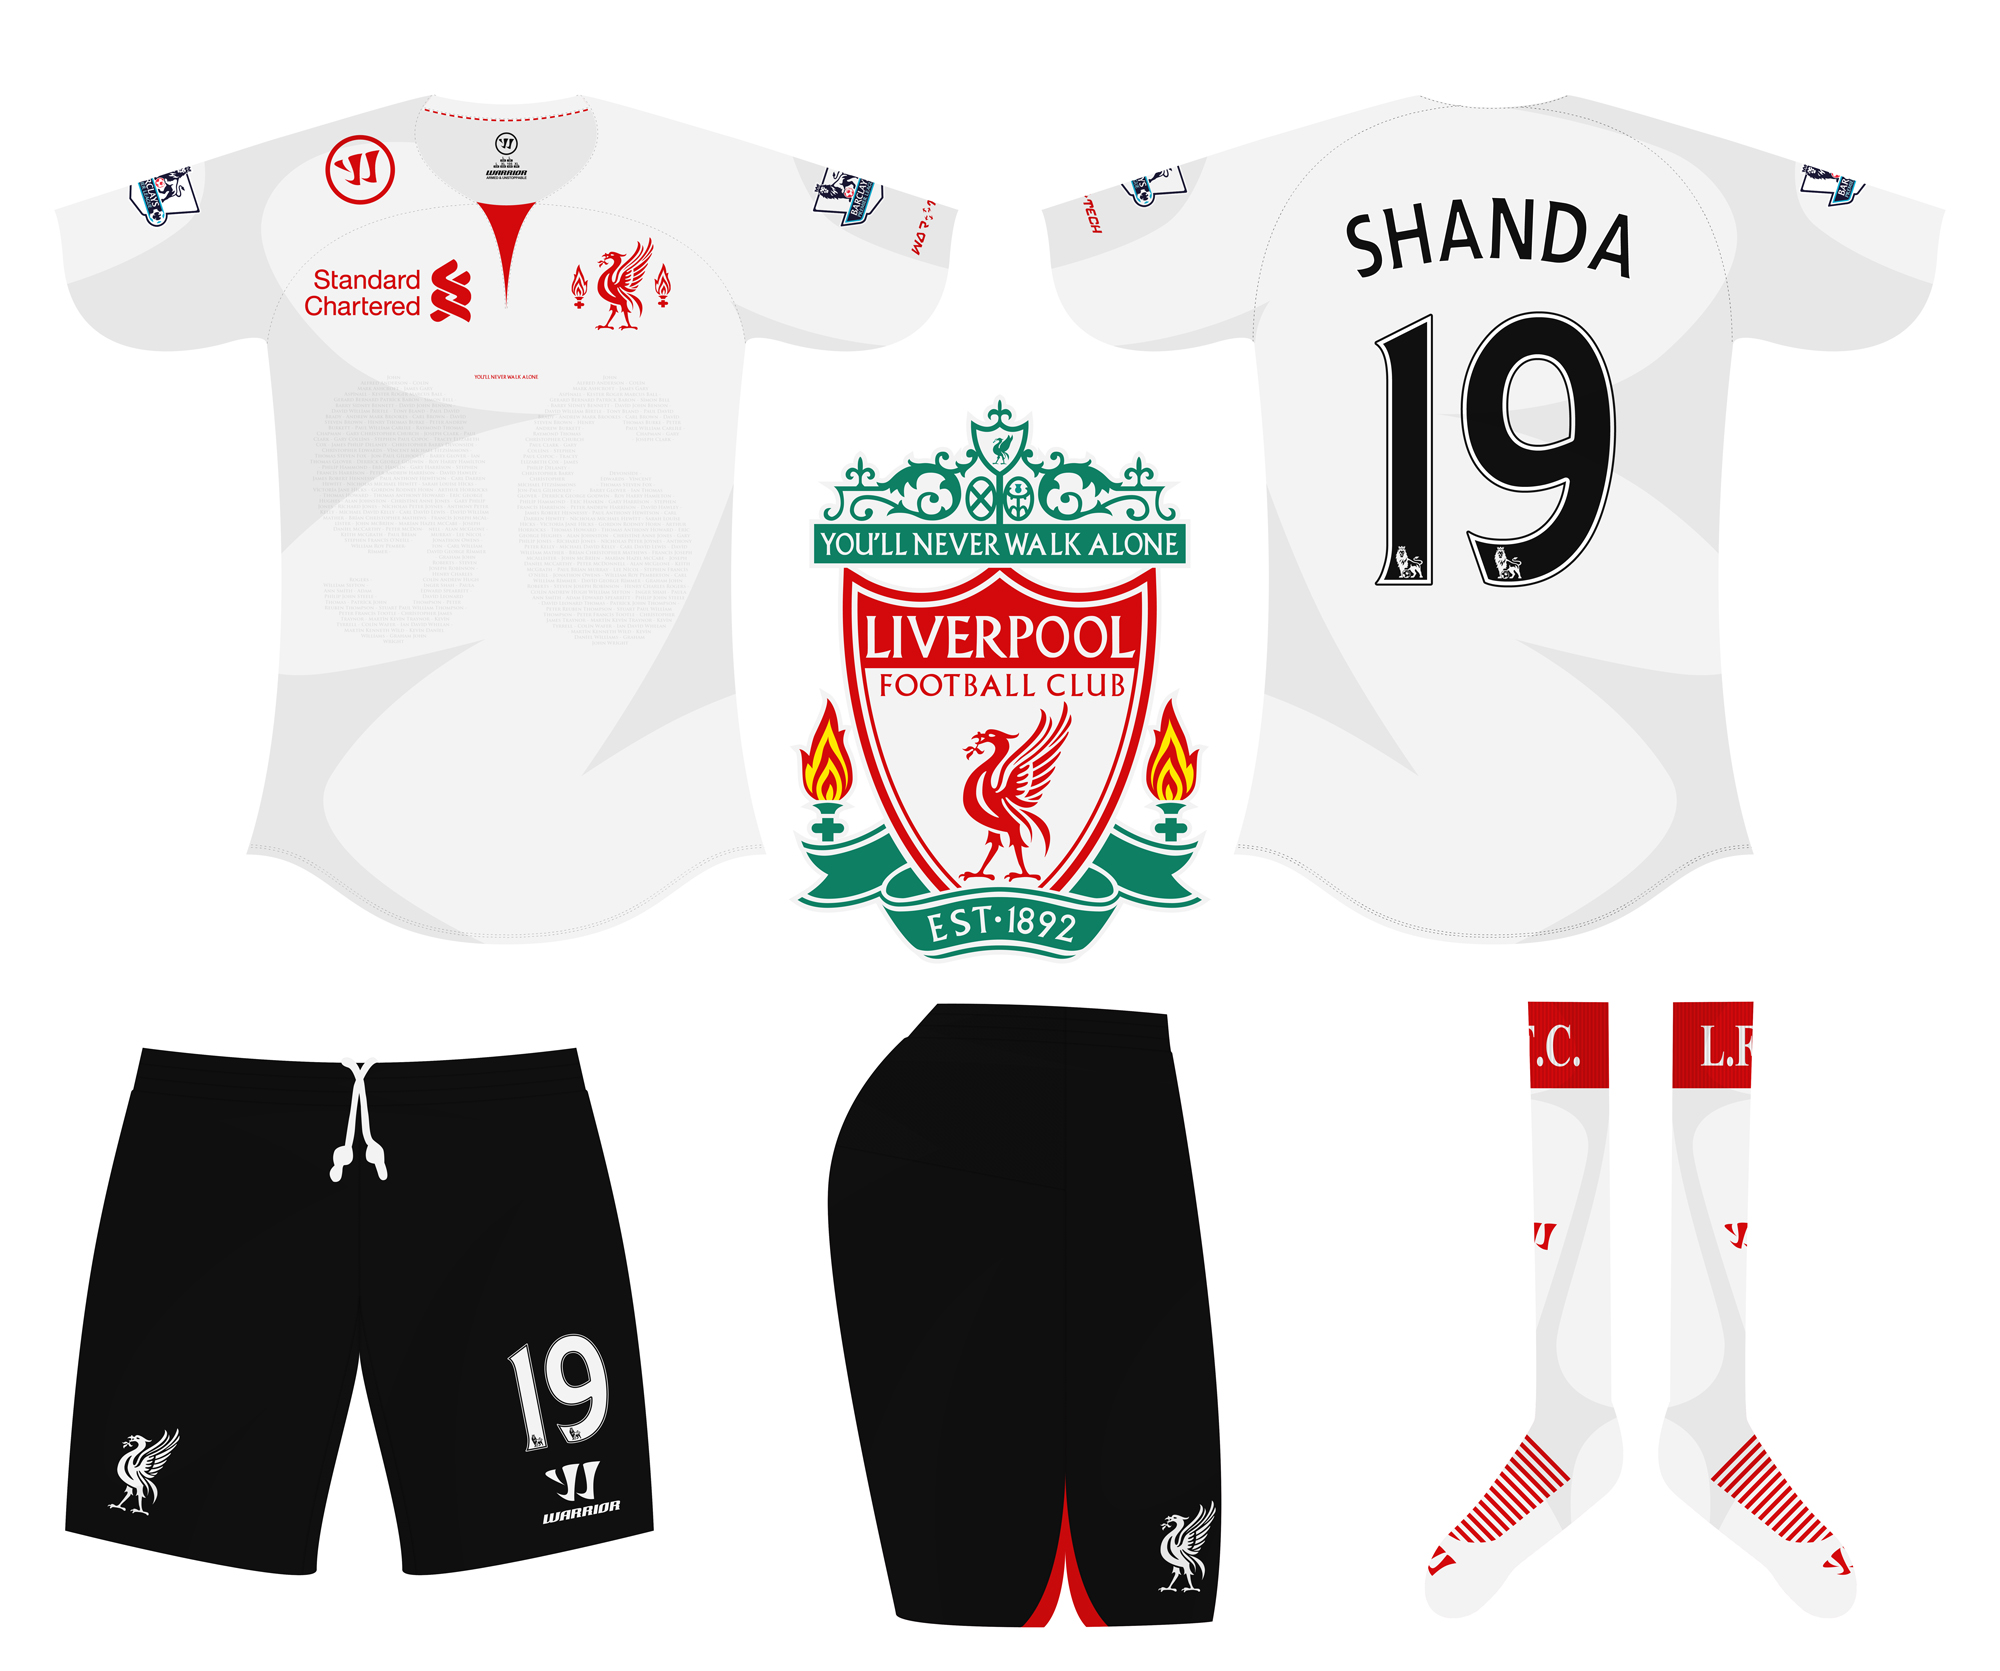 Liverpool_away.jpg